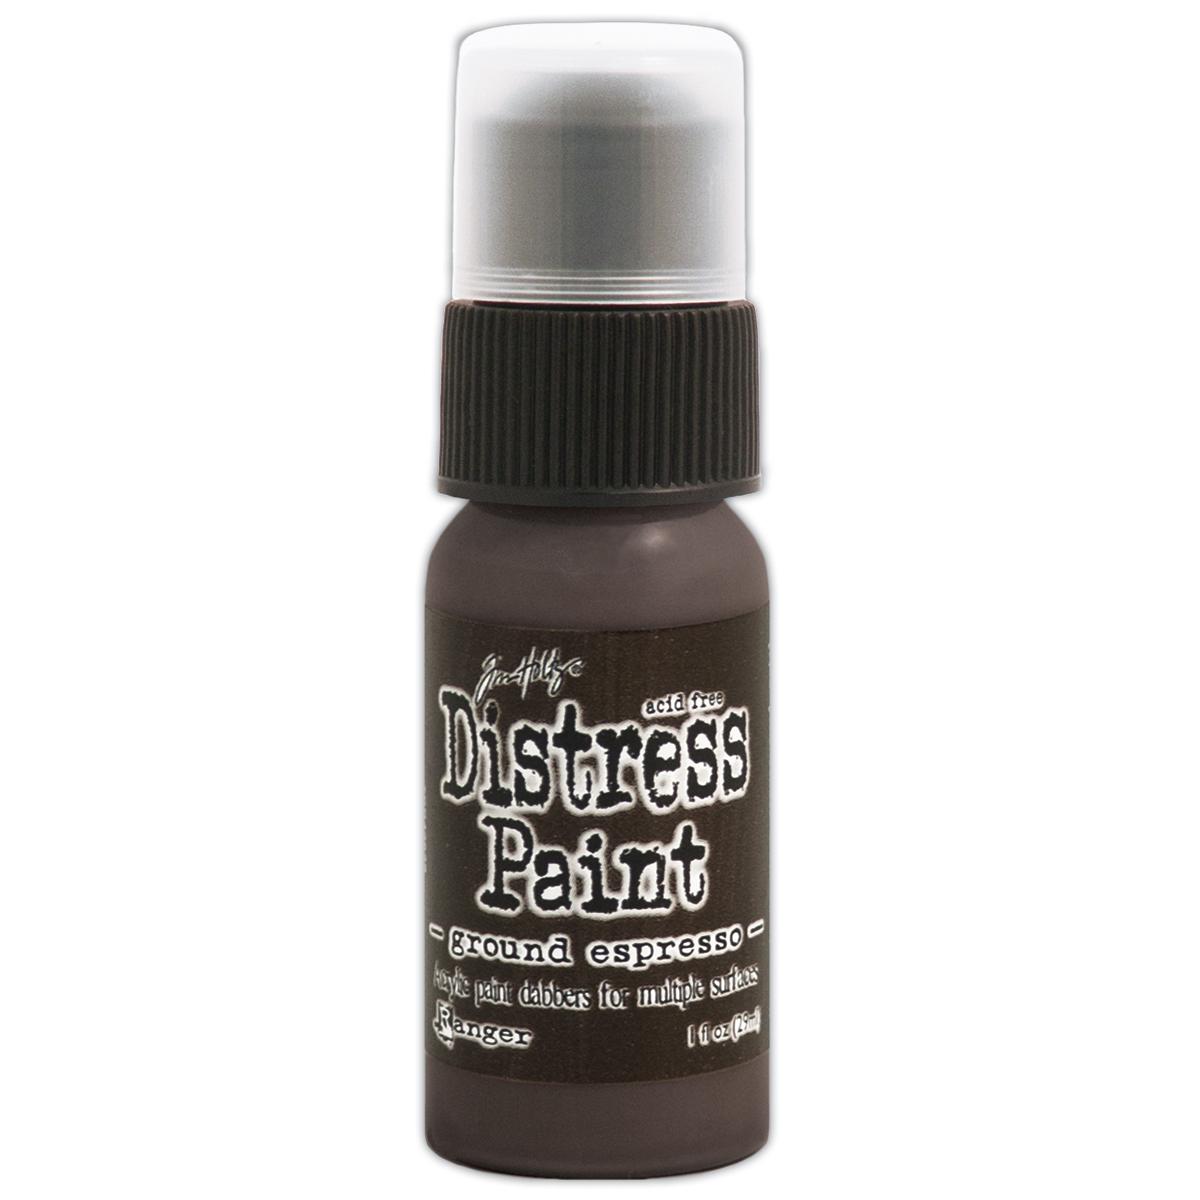 Distress Paint Ground Espresso